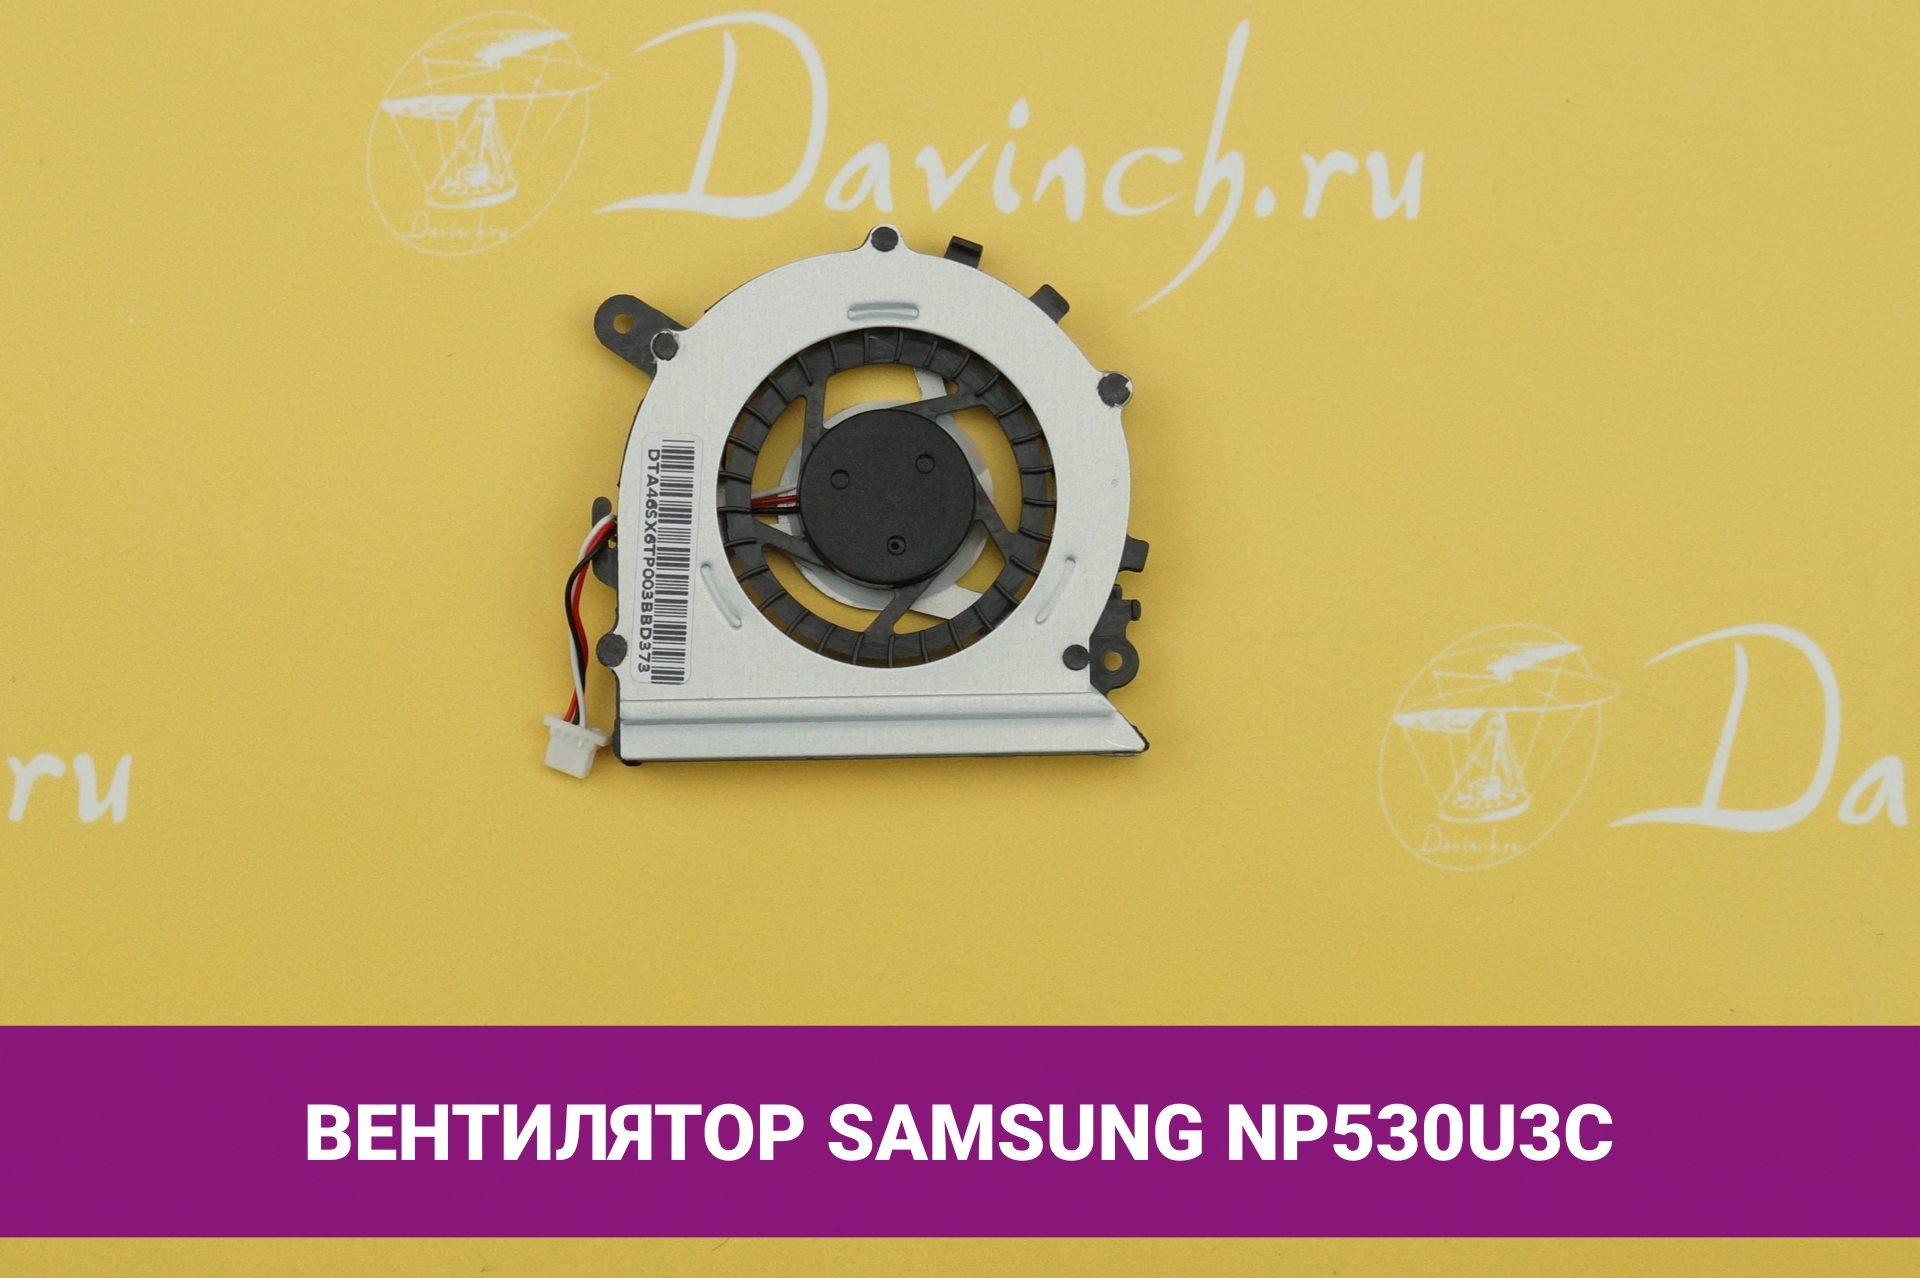 Вентилятор для ноутбука SAMSUNG NP530U3C